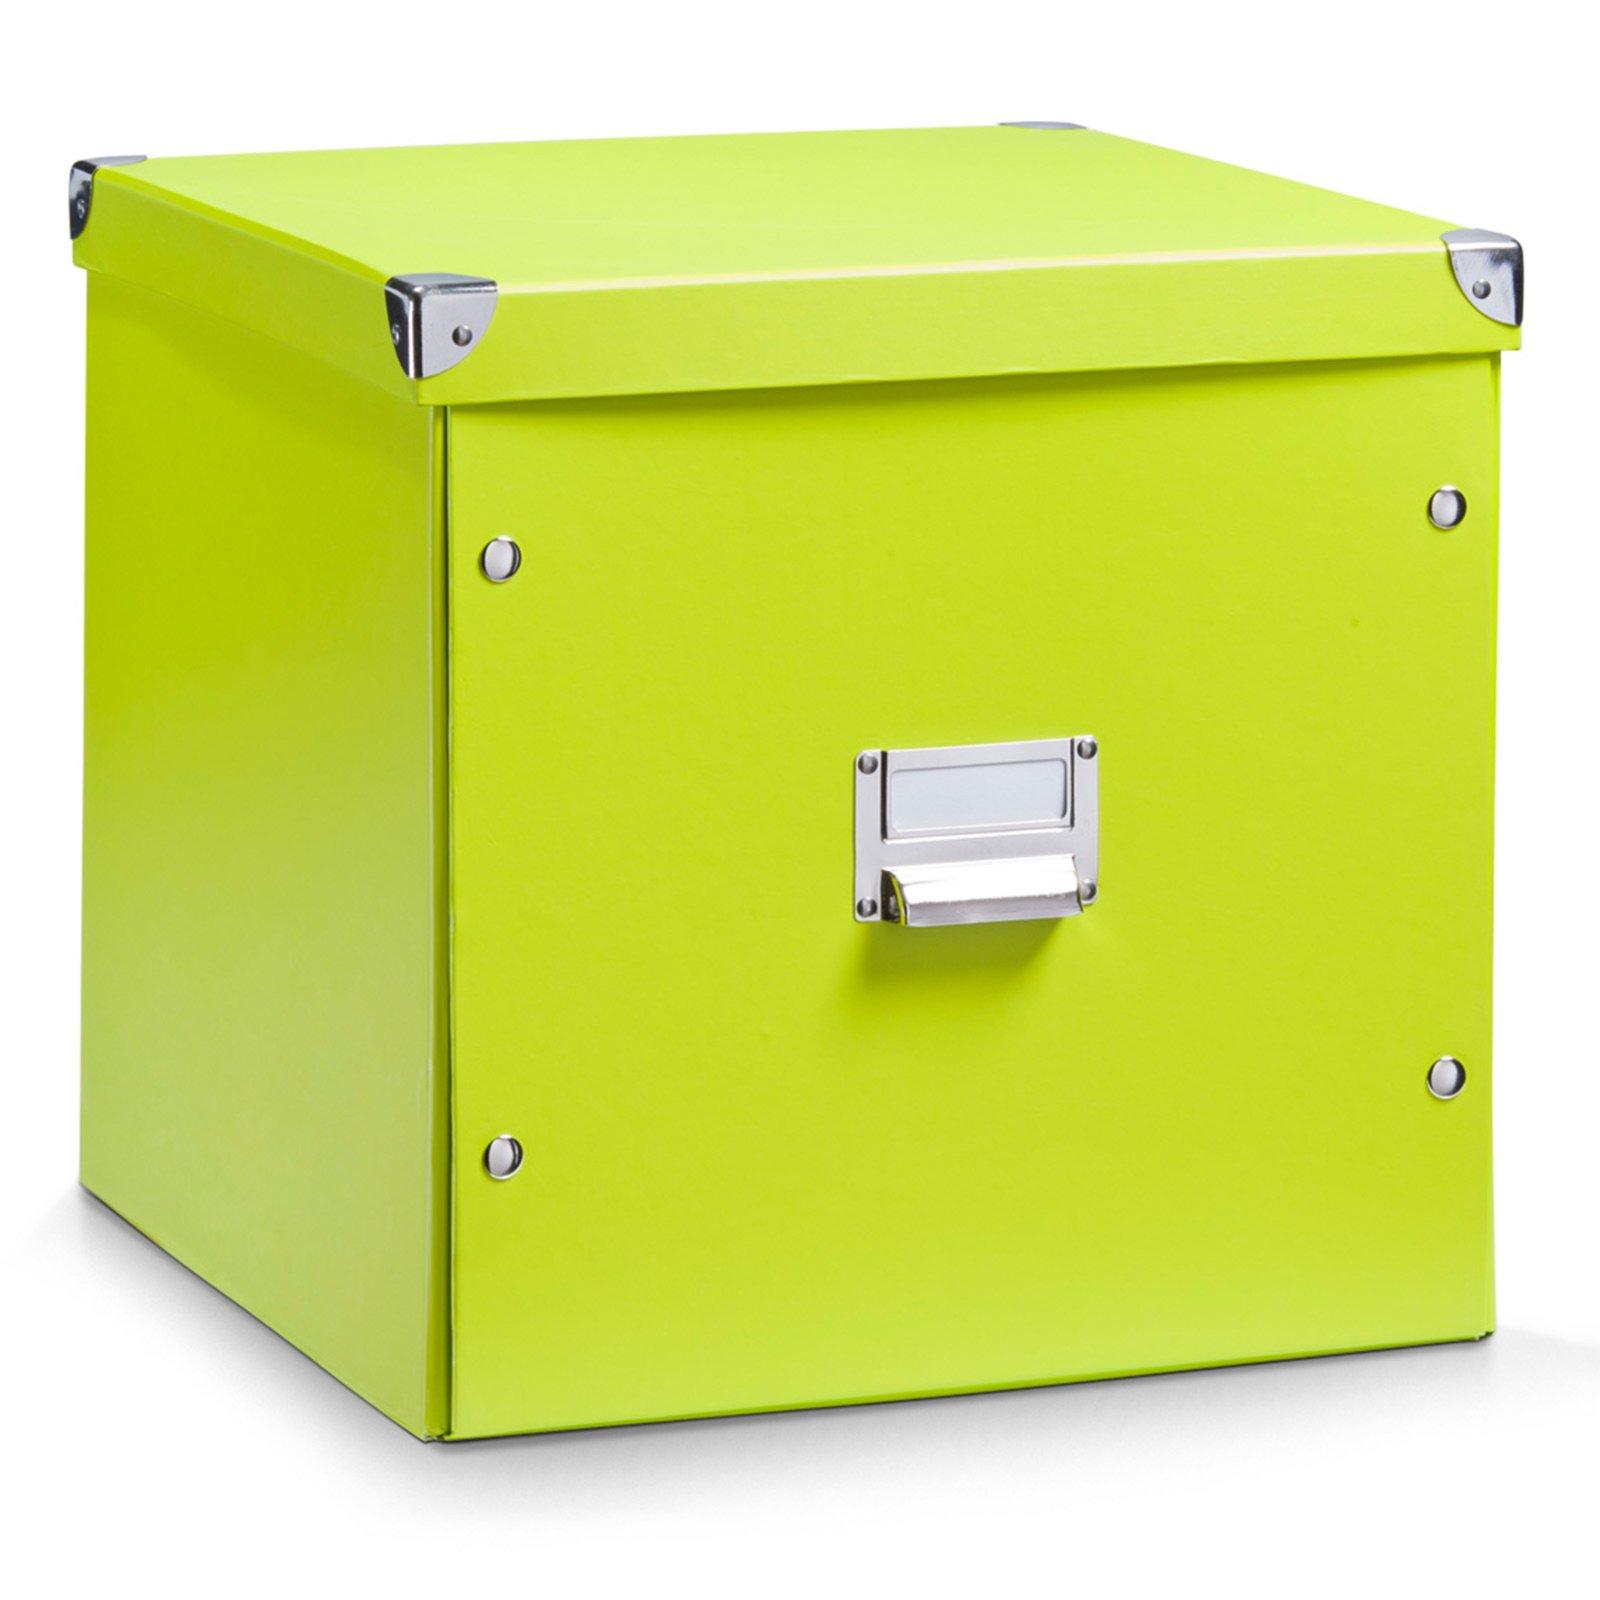 aufbewahrungsbox gr n faltbar 33 5x33 cm boxen k rbe deko haushalt m belhaus roller. Black Bedroom Furniture Sets. Home Design Ideas